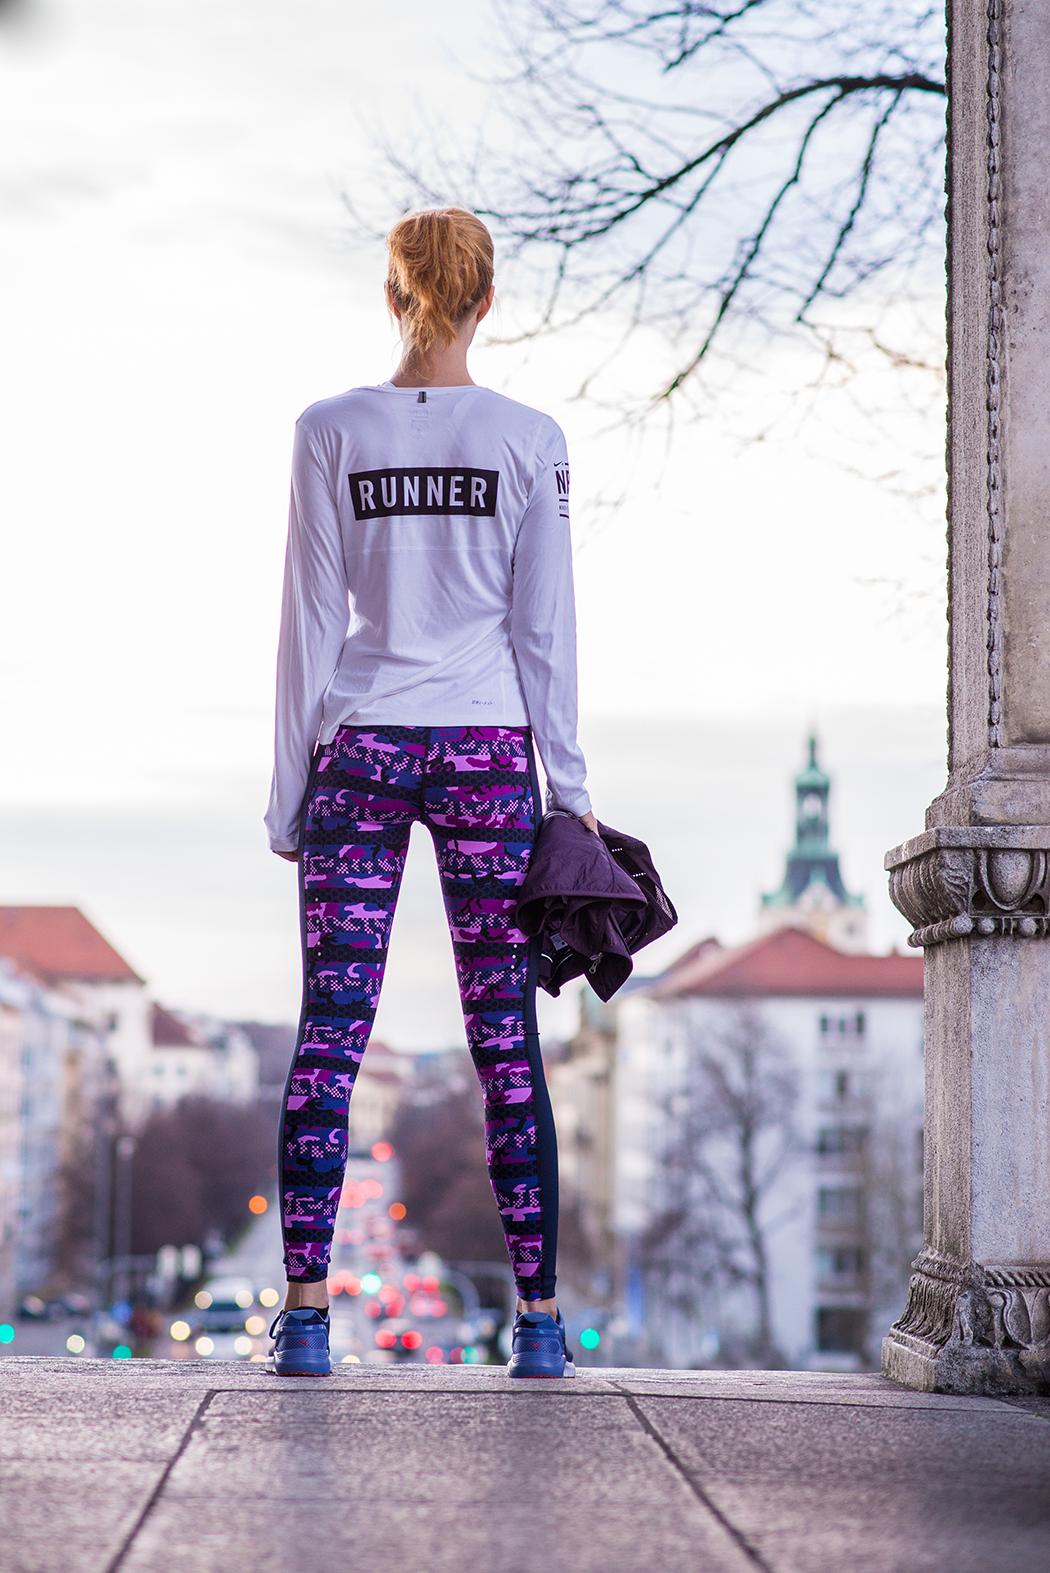 Fitnessblog-Fitnessblogger-Fitness-Blog-Blogger-Running-Nike-Hyperwarm-NRC-Munich-Runner-10-web